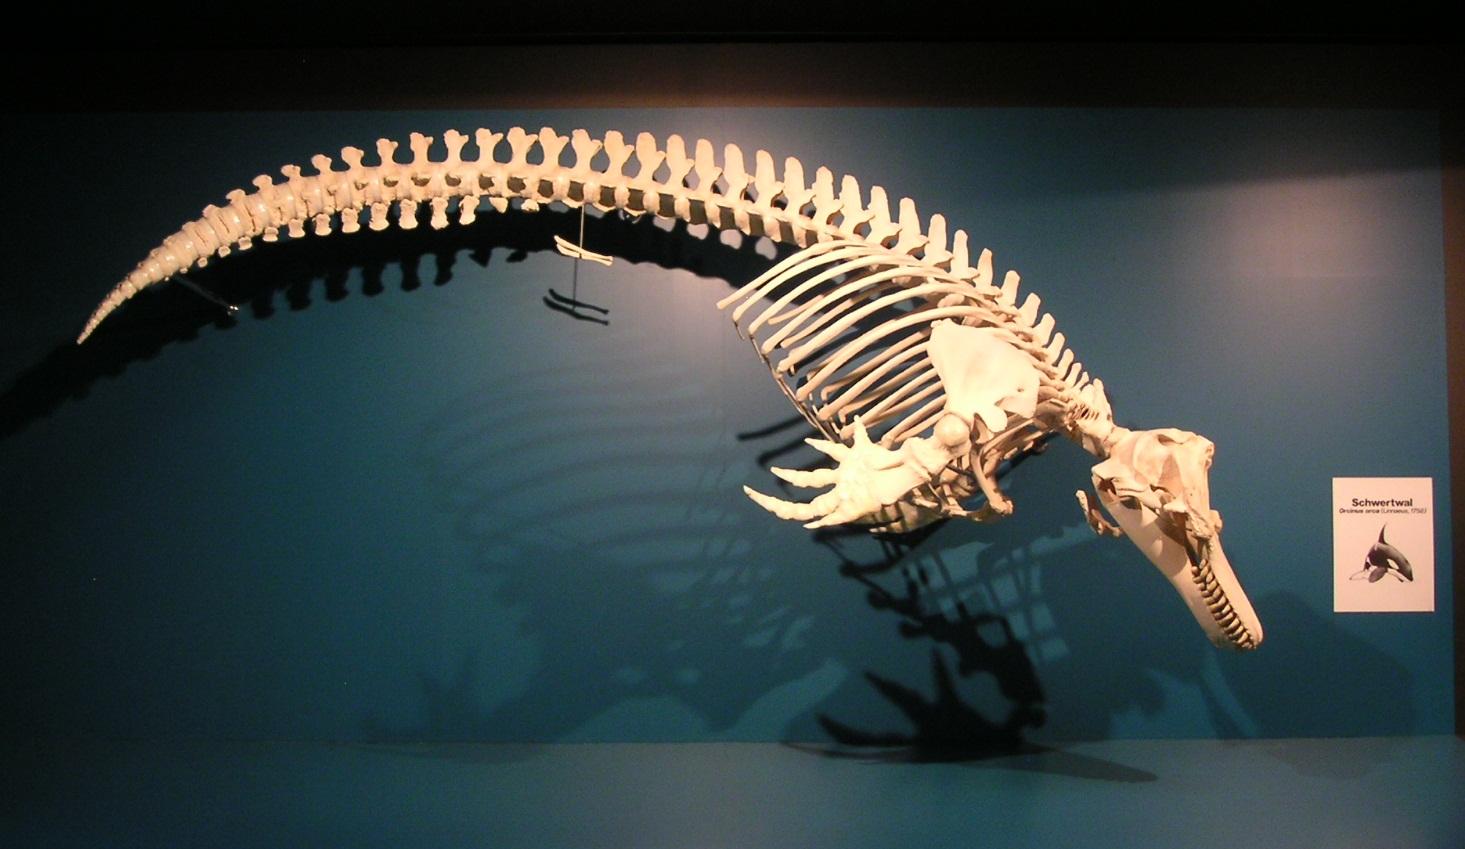 Orca-Skelett, Zoologisches Museum Hamburg